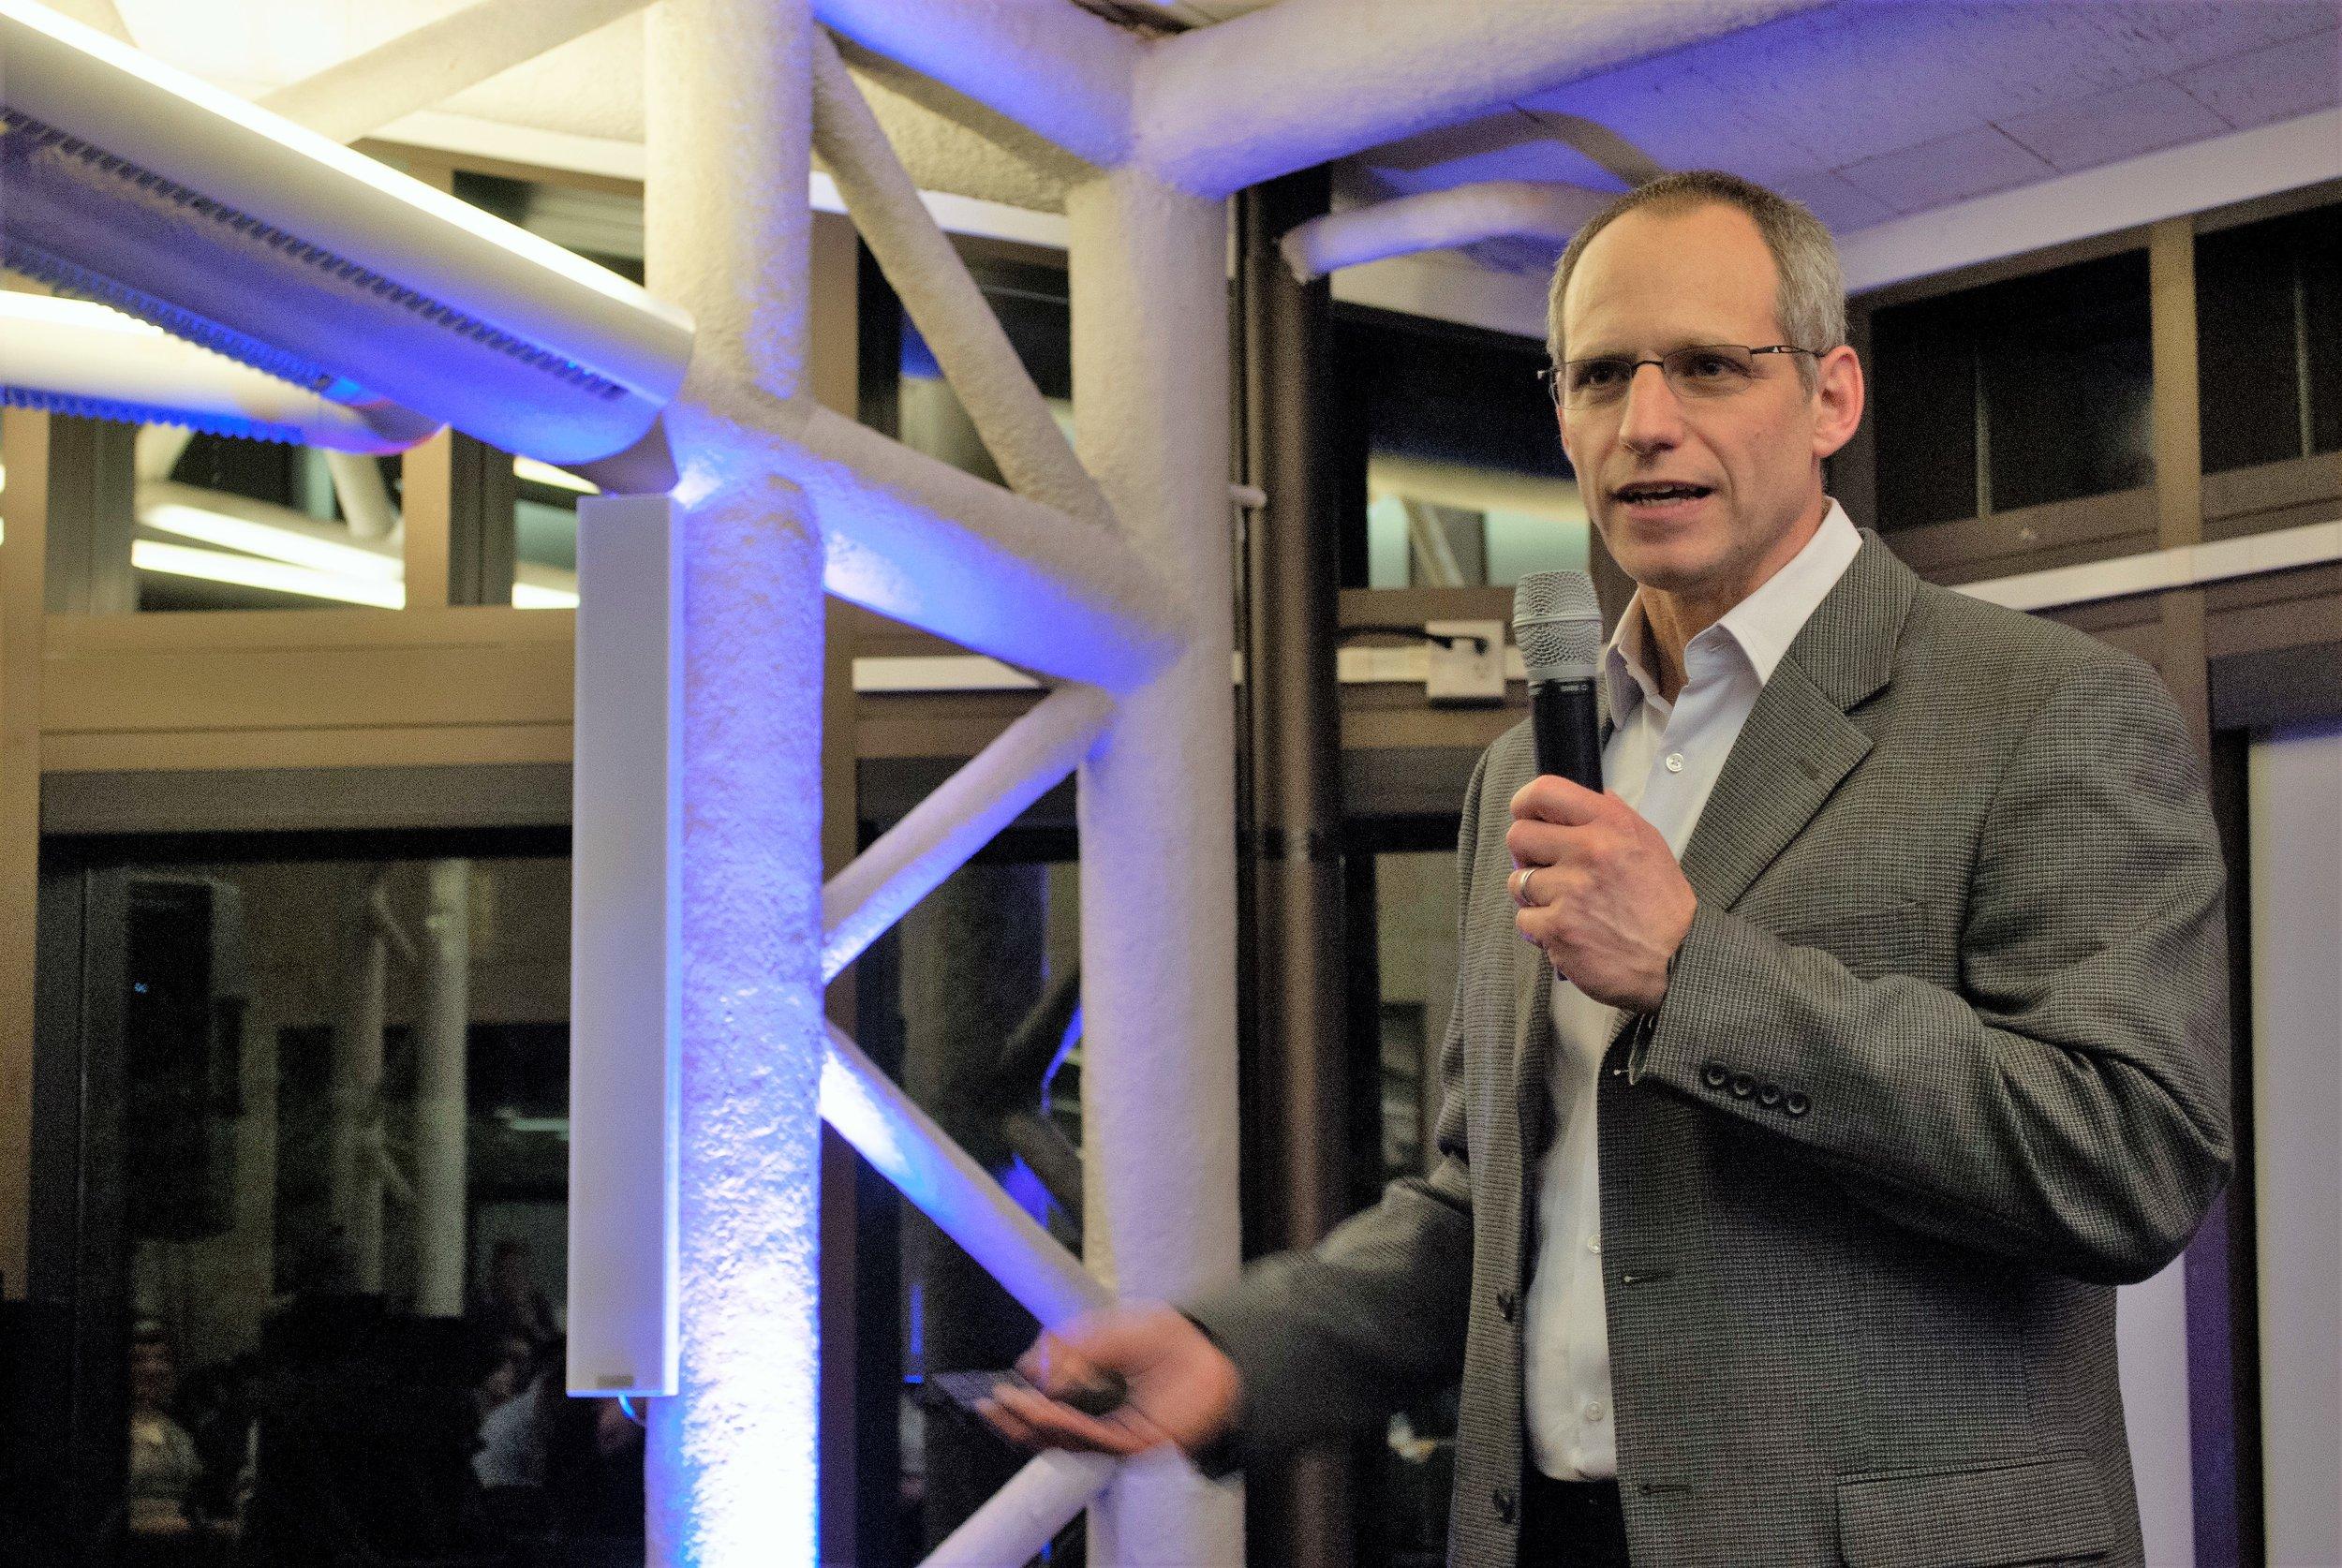 Dr. Dan Sidney, Standup Comedy